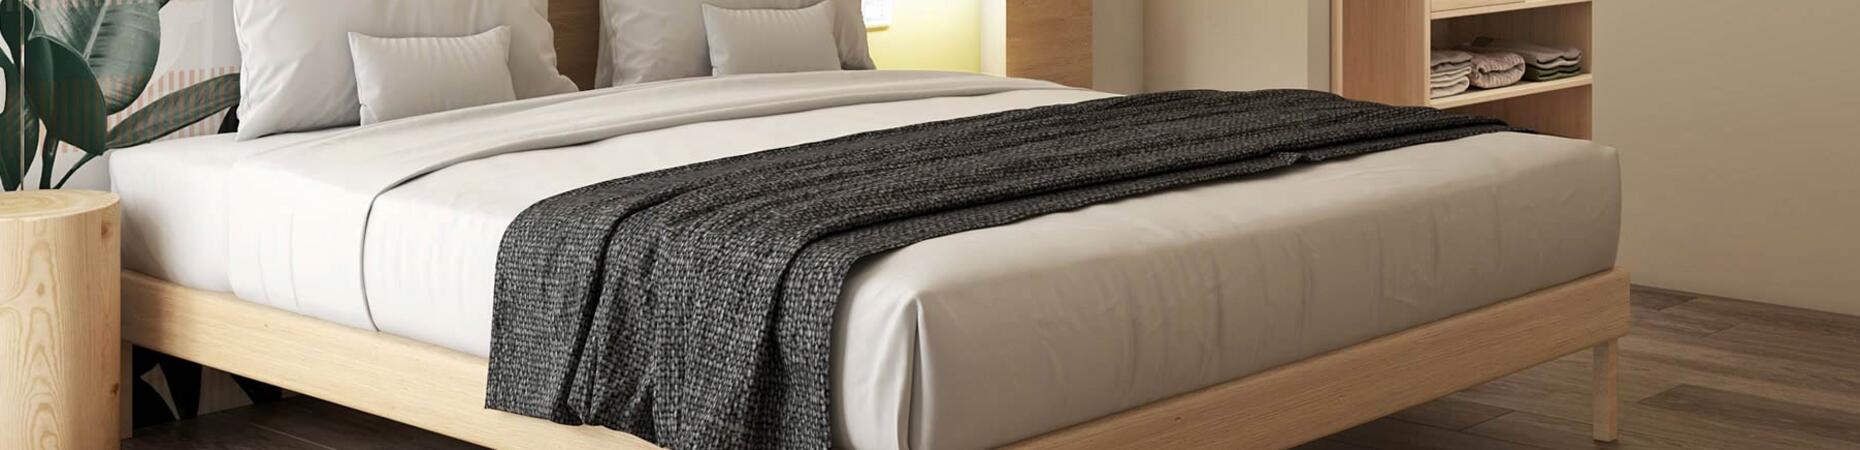 hotelhollywood en rooms 013